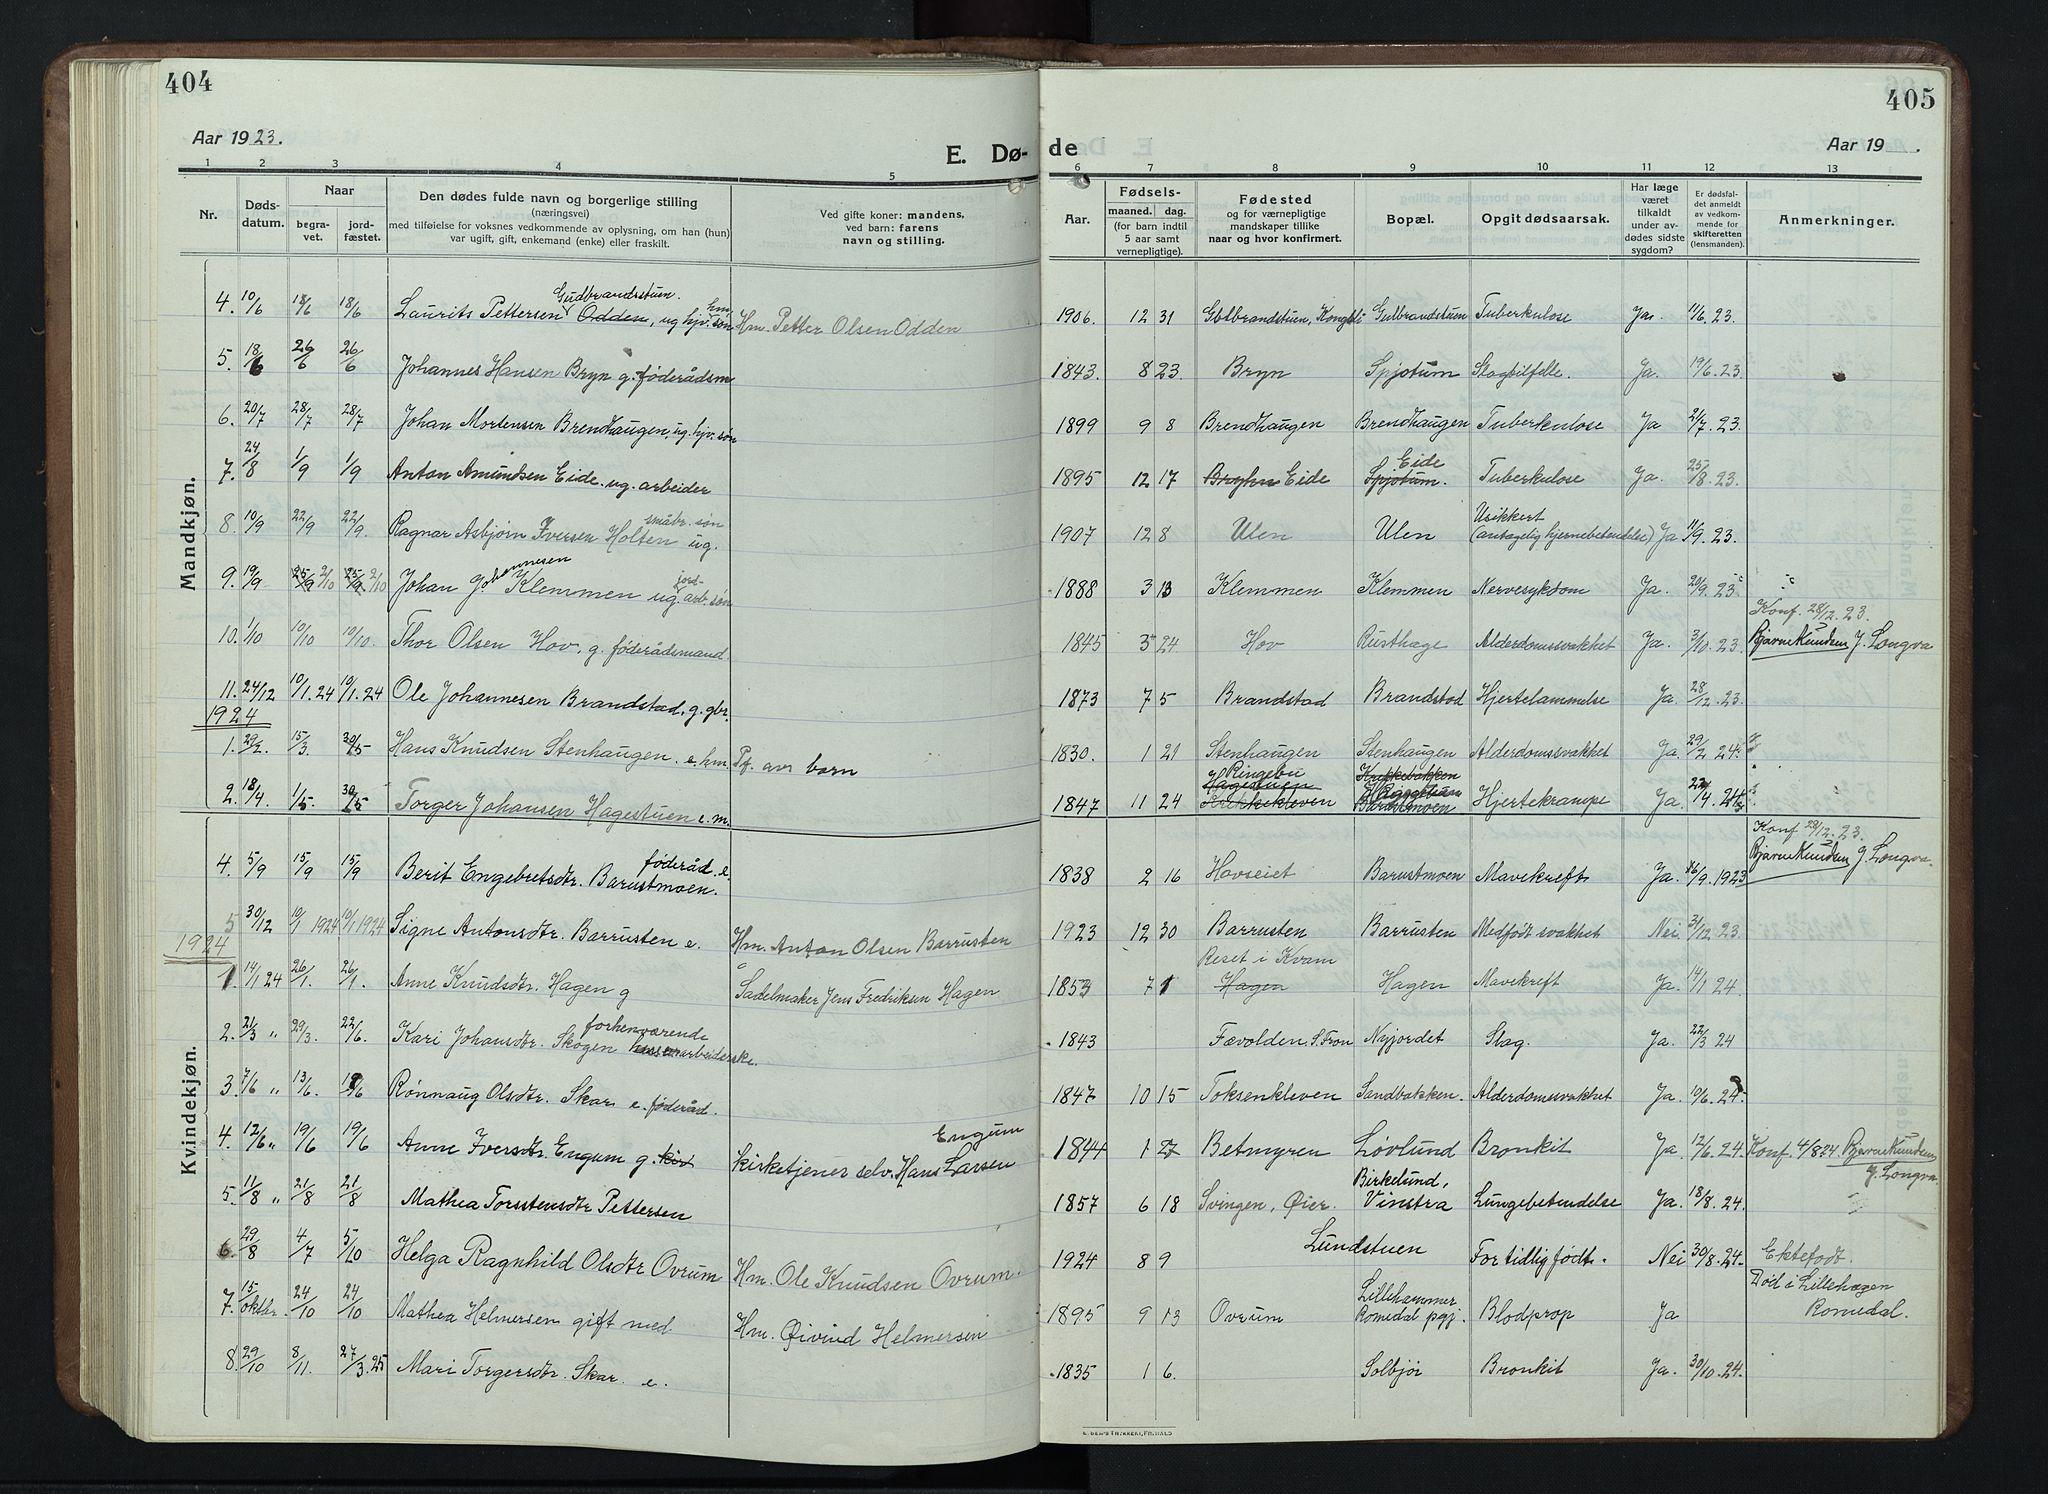 SAH, Nord-Fron prestekontor, Klokkerbok nr. 7, 1915-1946, s. 404-405